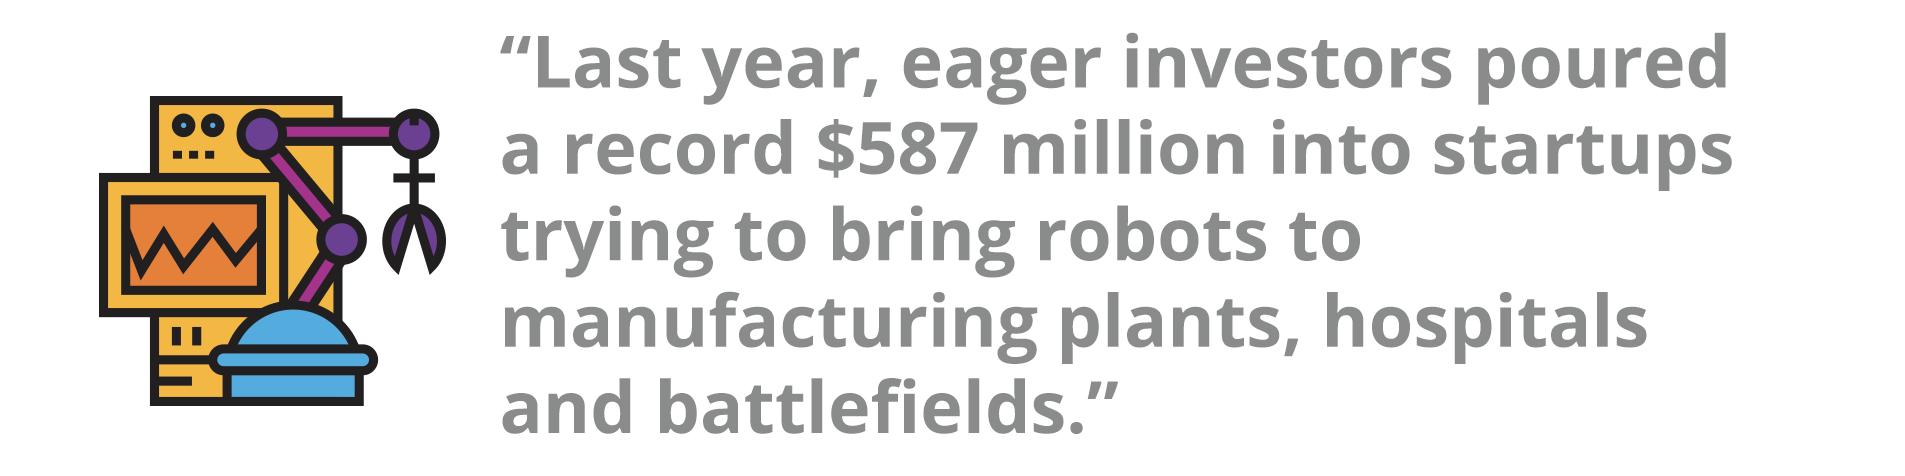 Robot stat